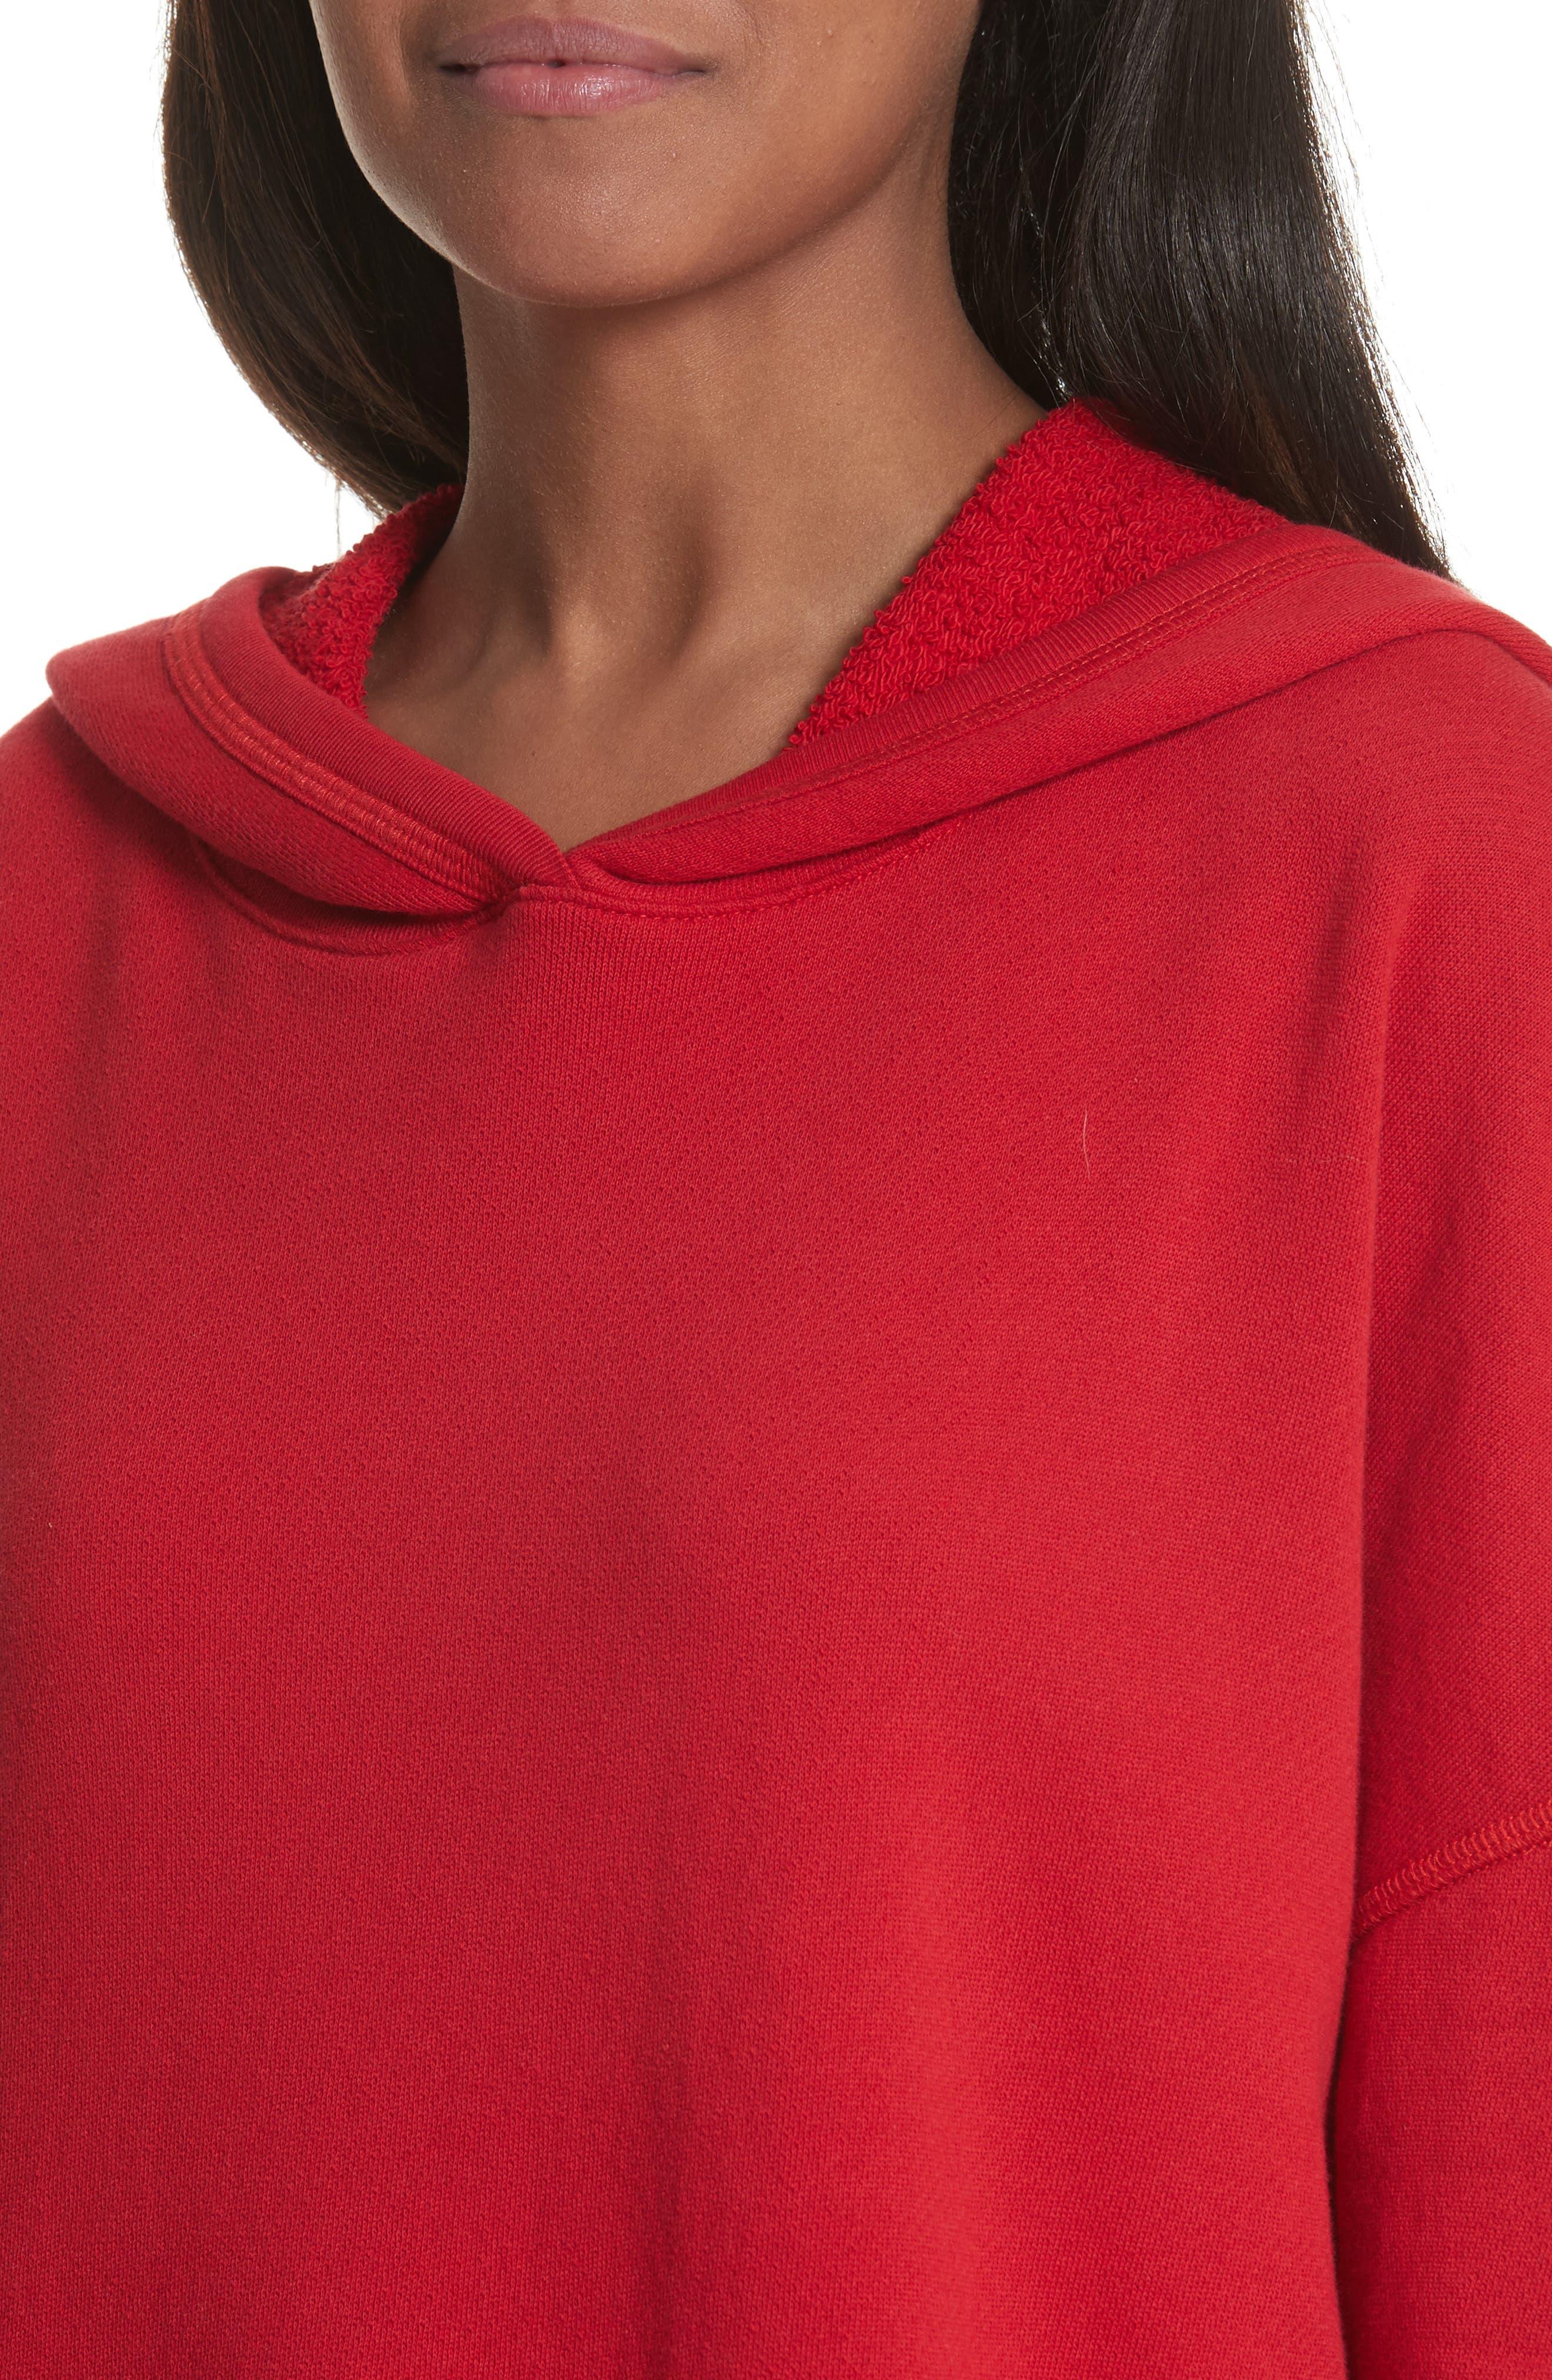 Adene Hooded Sweatshirt,                             Alternate thumbnail 4, color,                             600